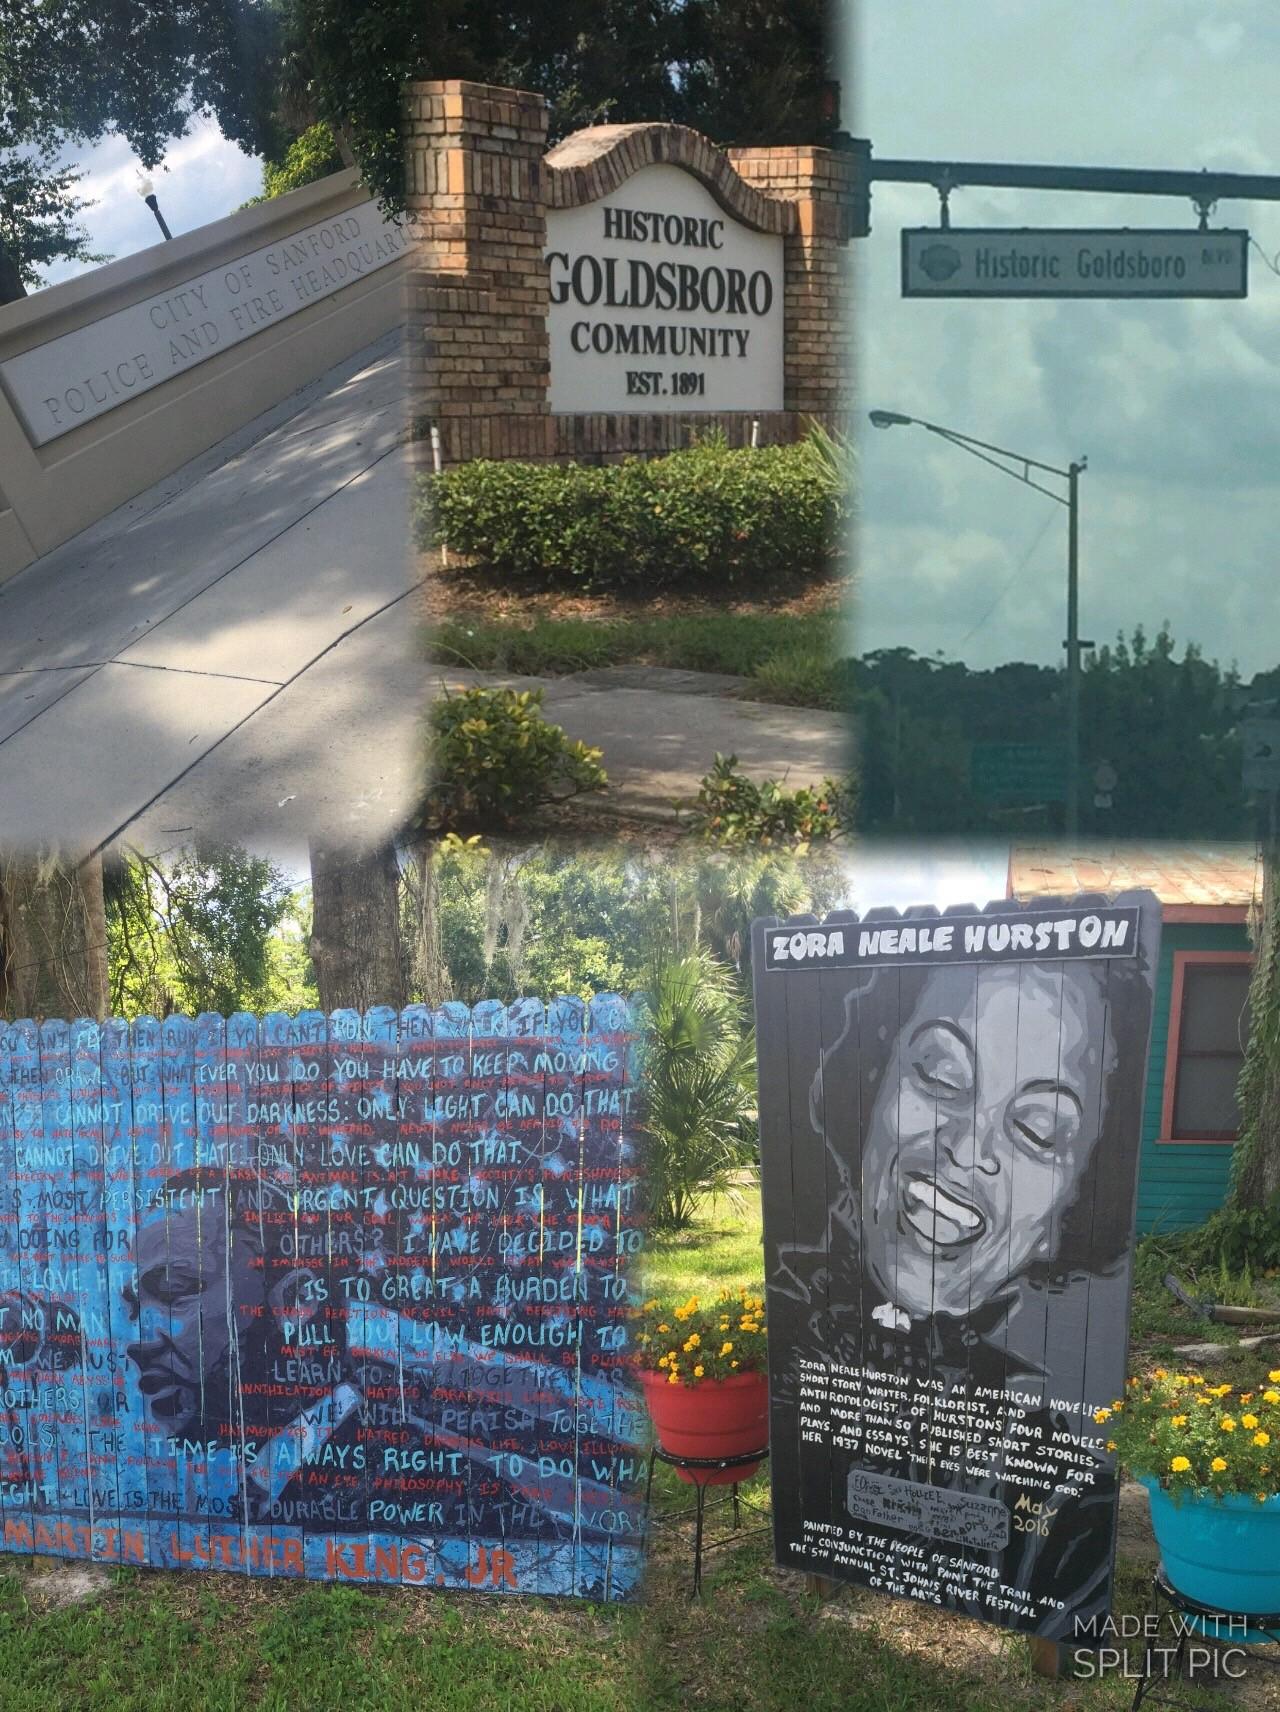 Pictures of Historic Goldsboro Blvd